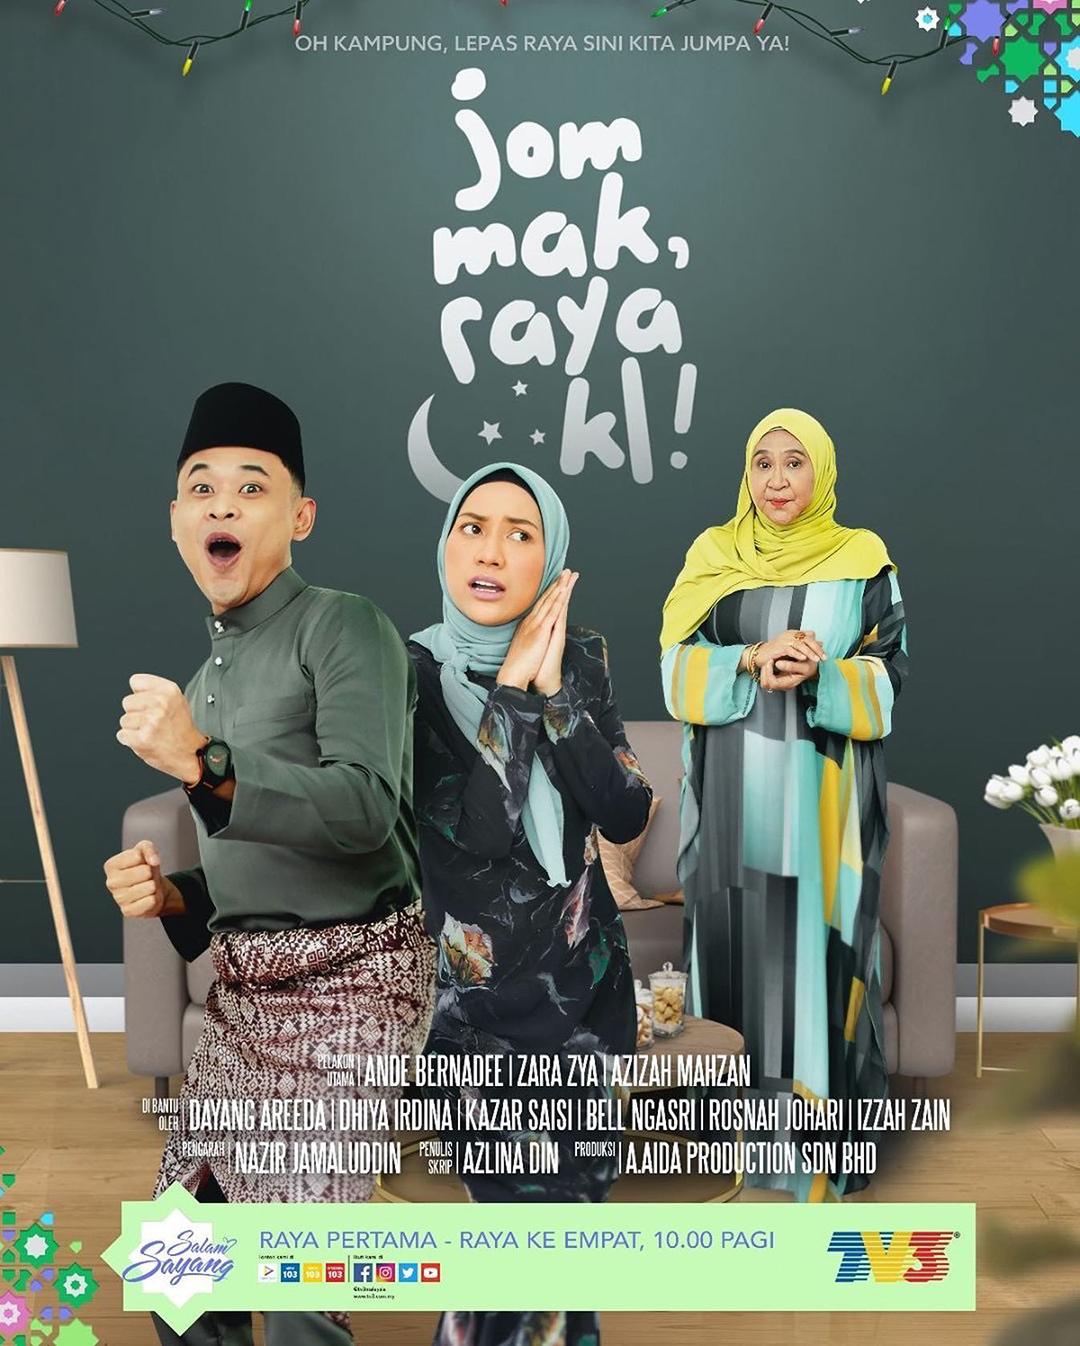 Drama jom mak raya kl tv3